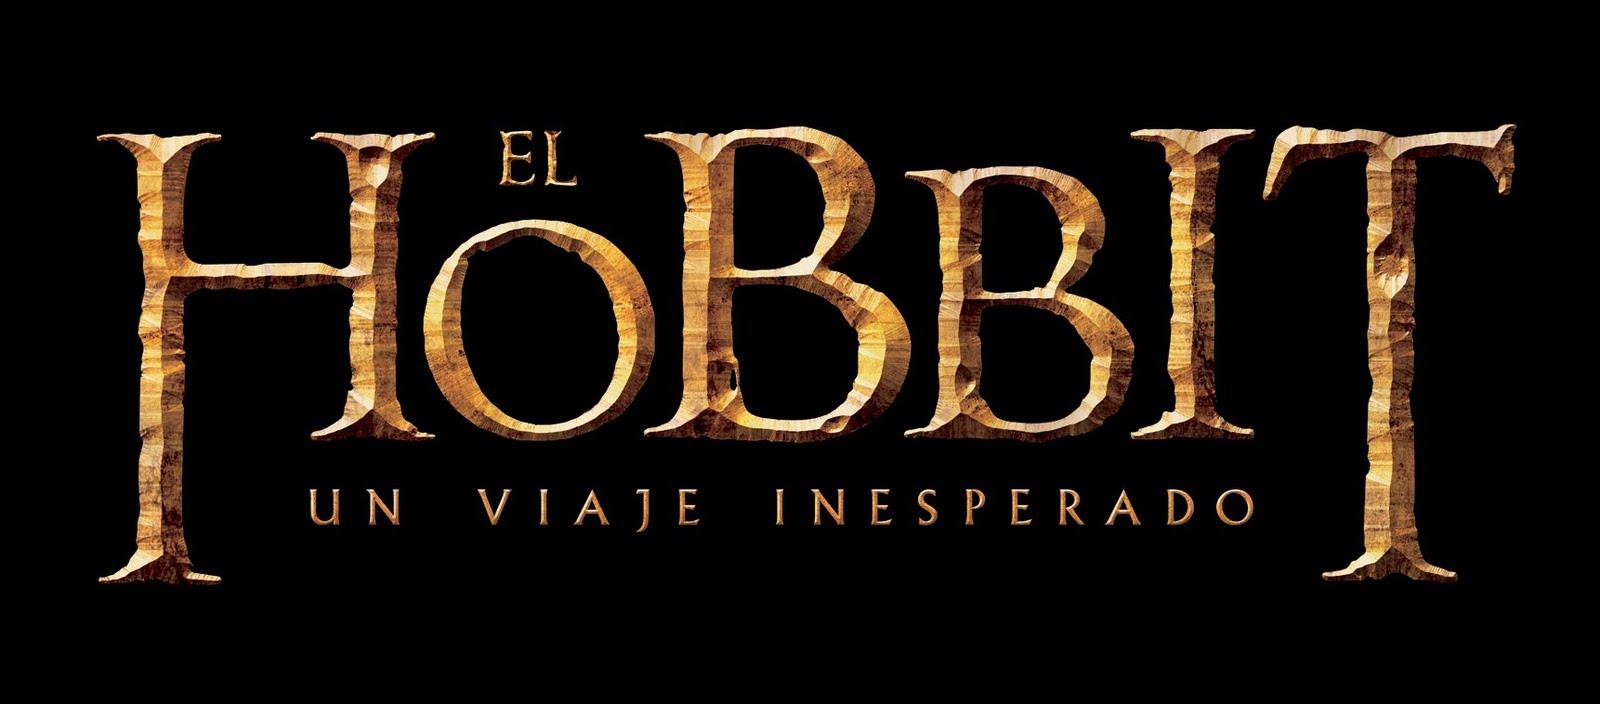 [Imagen: El-Hobbit-Un-viaje-inesperado.jpg]